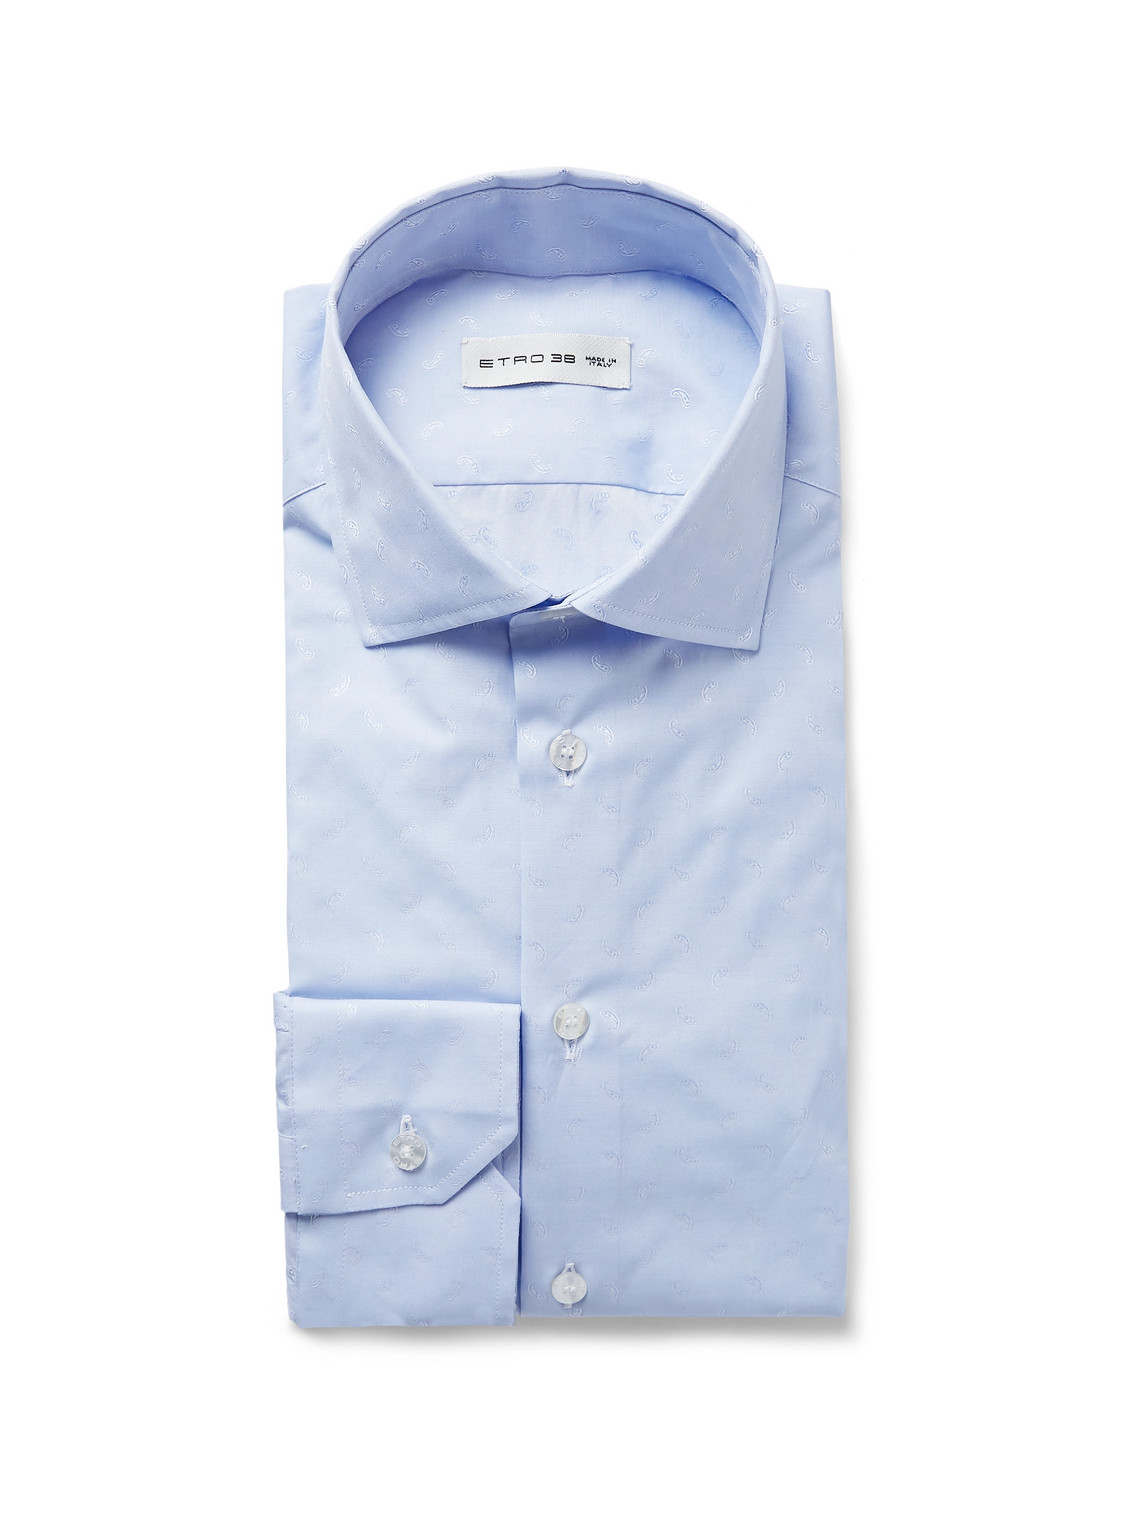 etro - light-blue slim-fit paisley-print cotton-poplin shirt - men - blue - eu 43